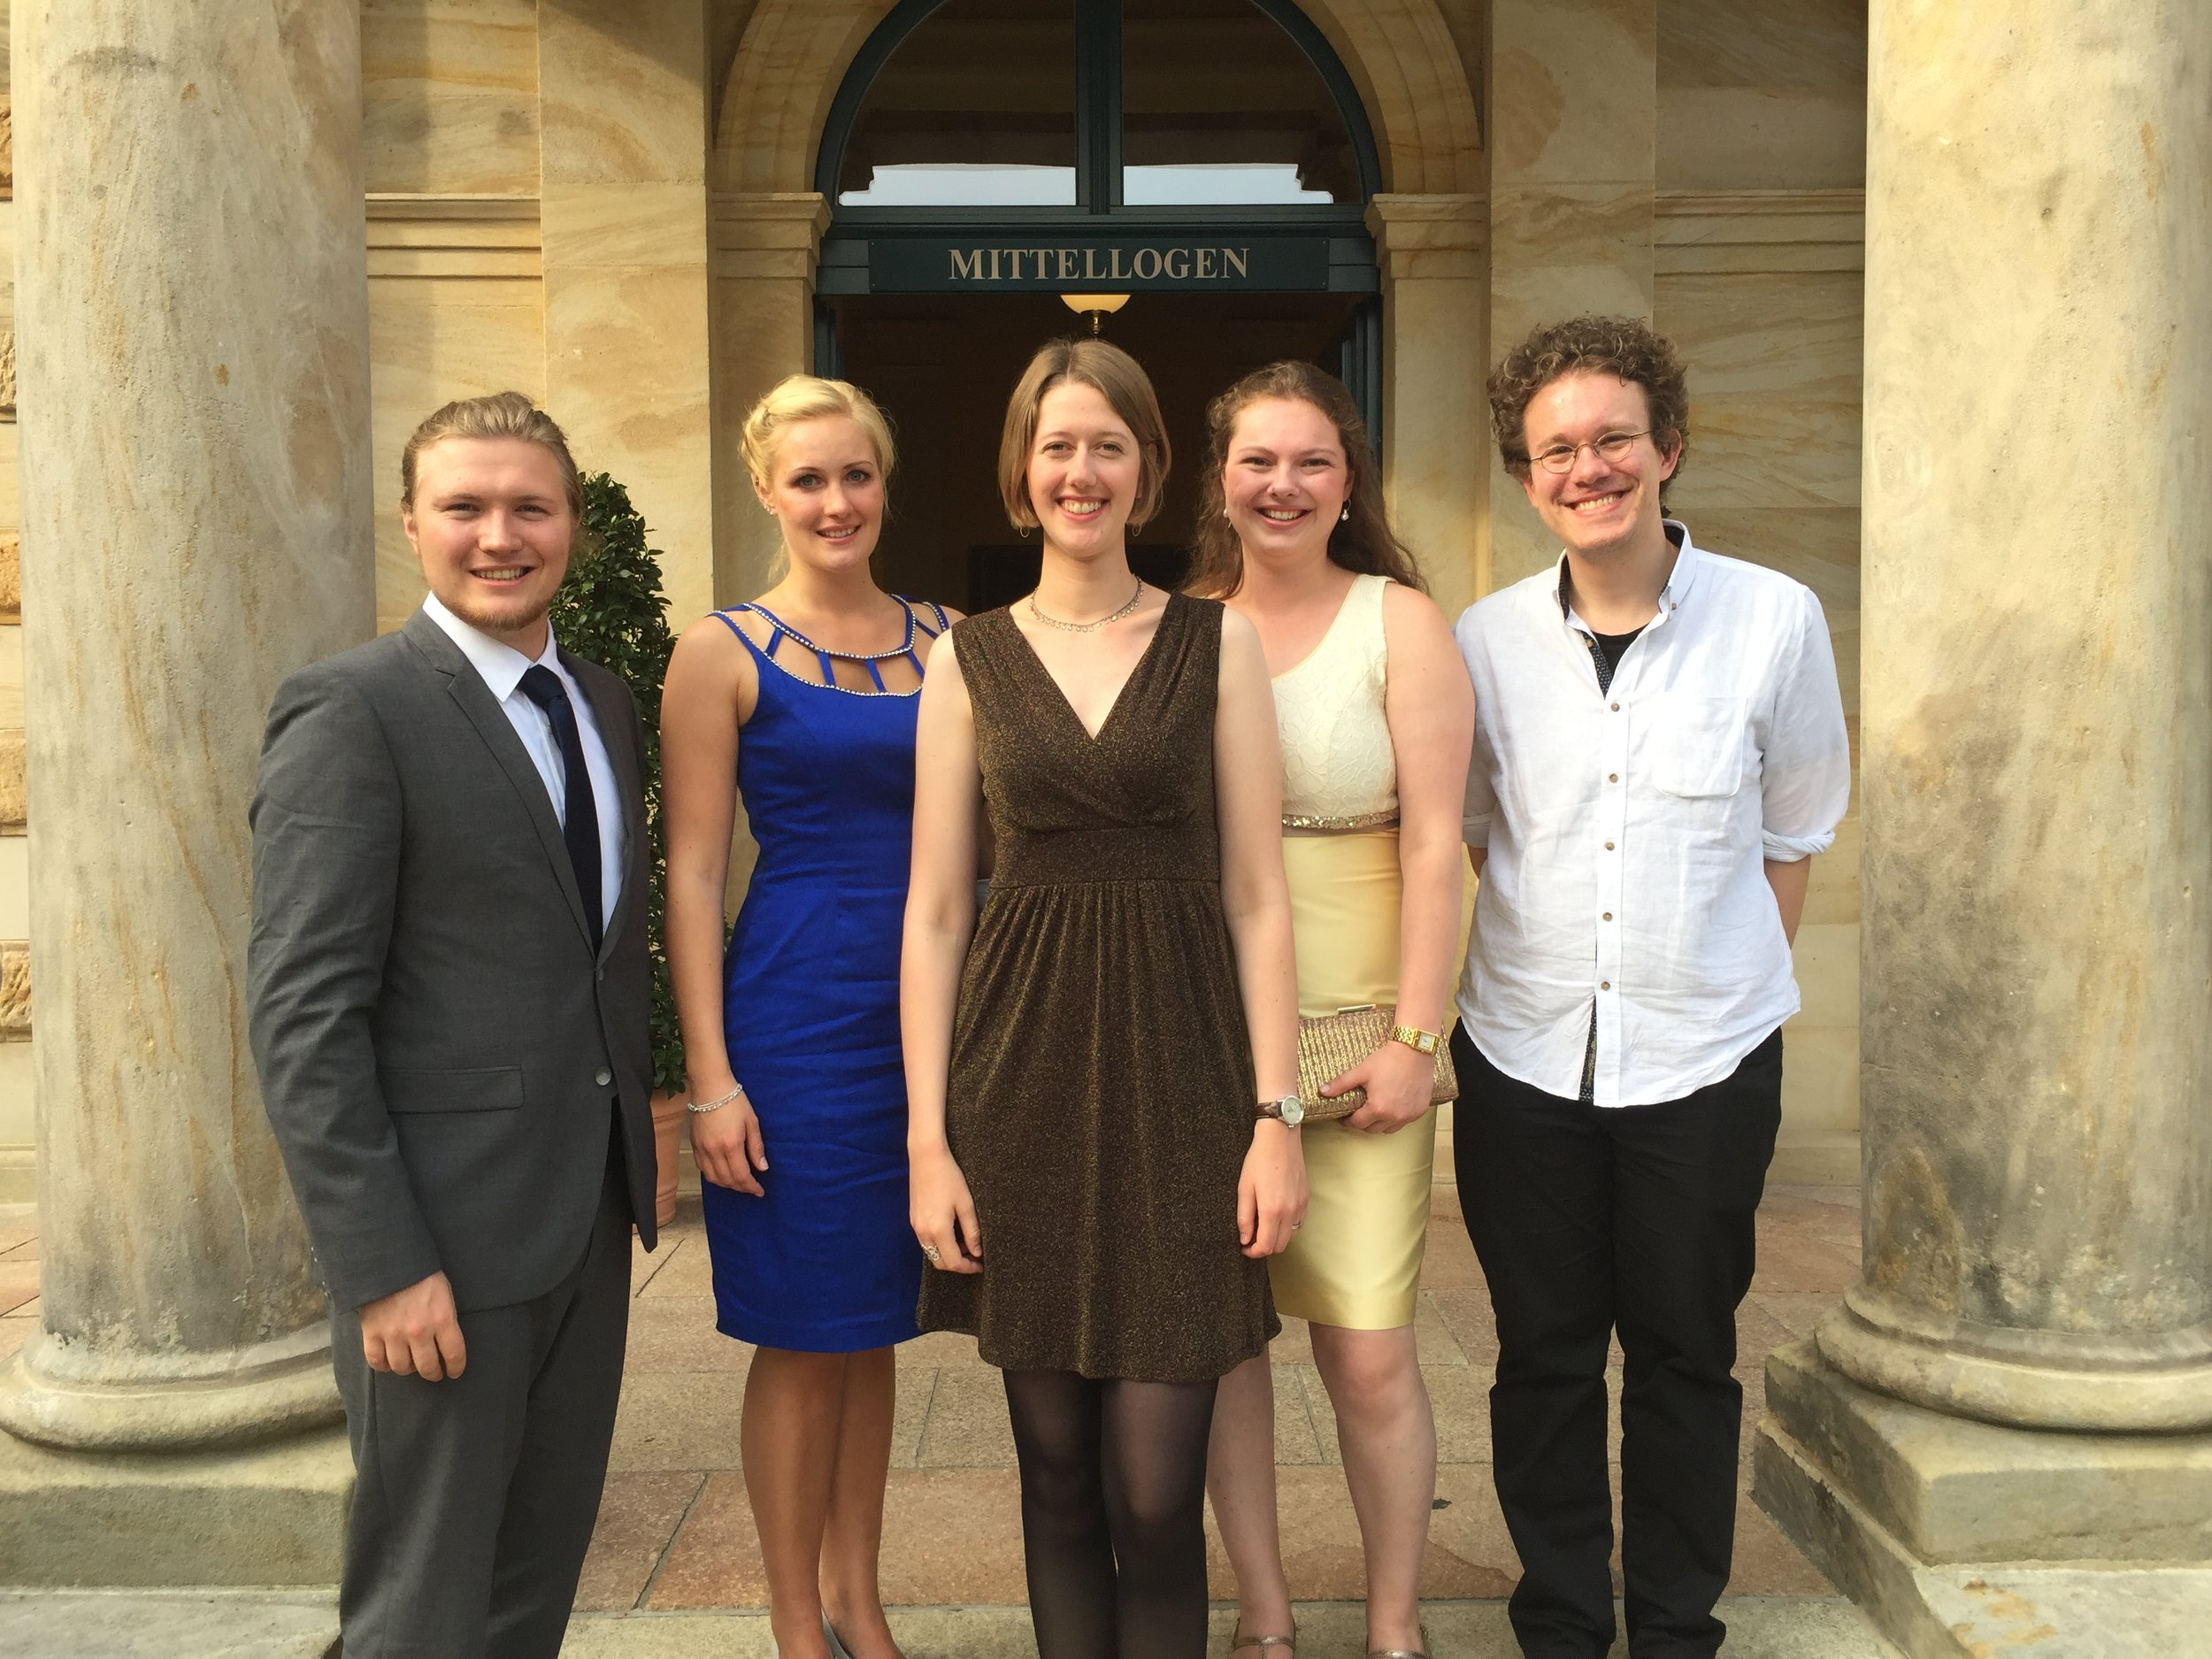 Von links nach rechts: Matthias Hoffmann, Katharina Borsch, Lina Hoffmann, Anna Lautwein, Jakob Cizmarovic